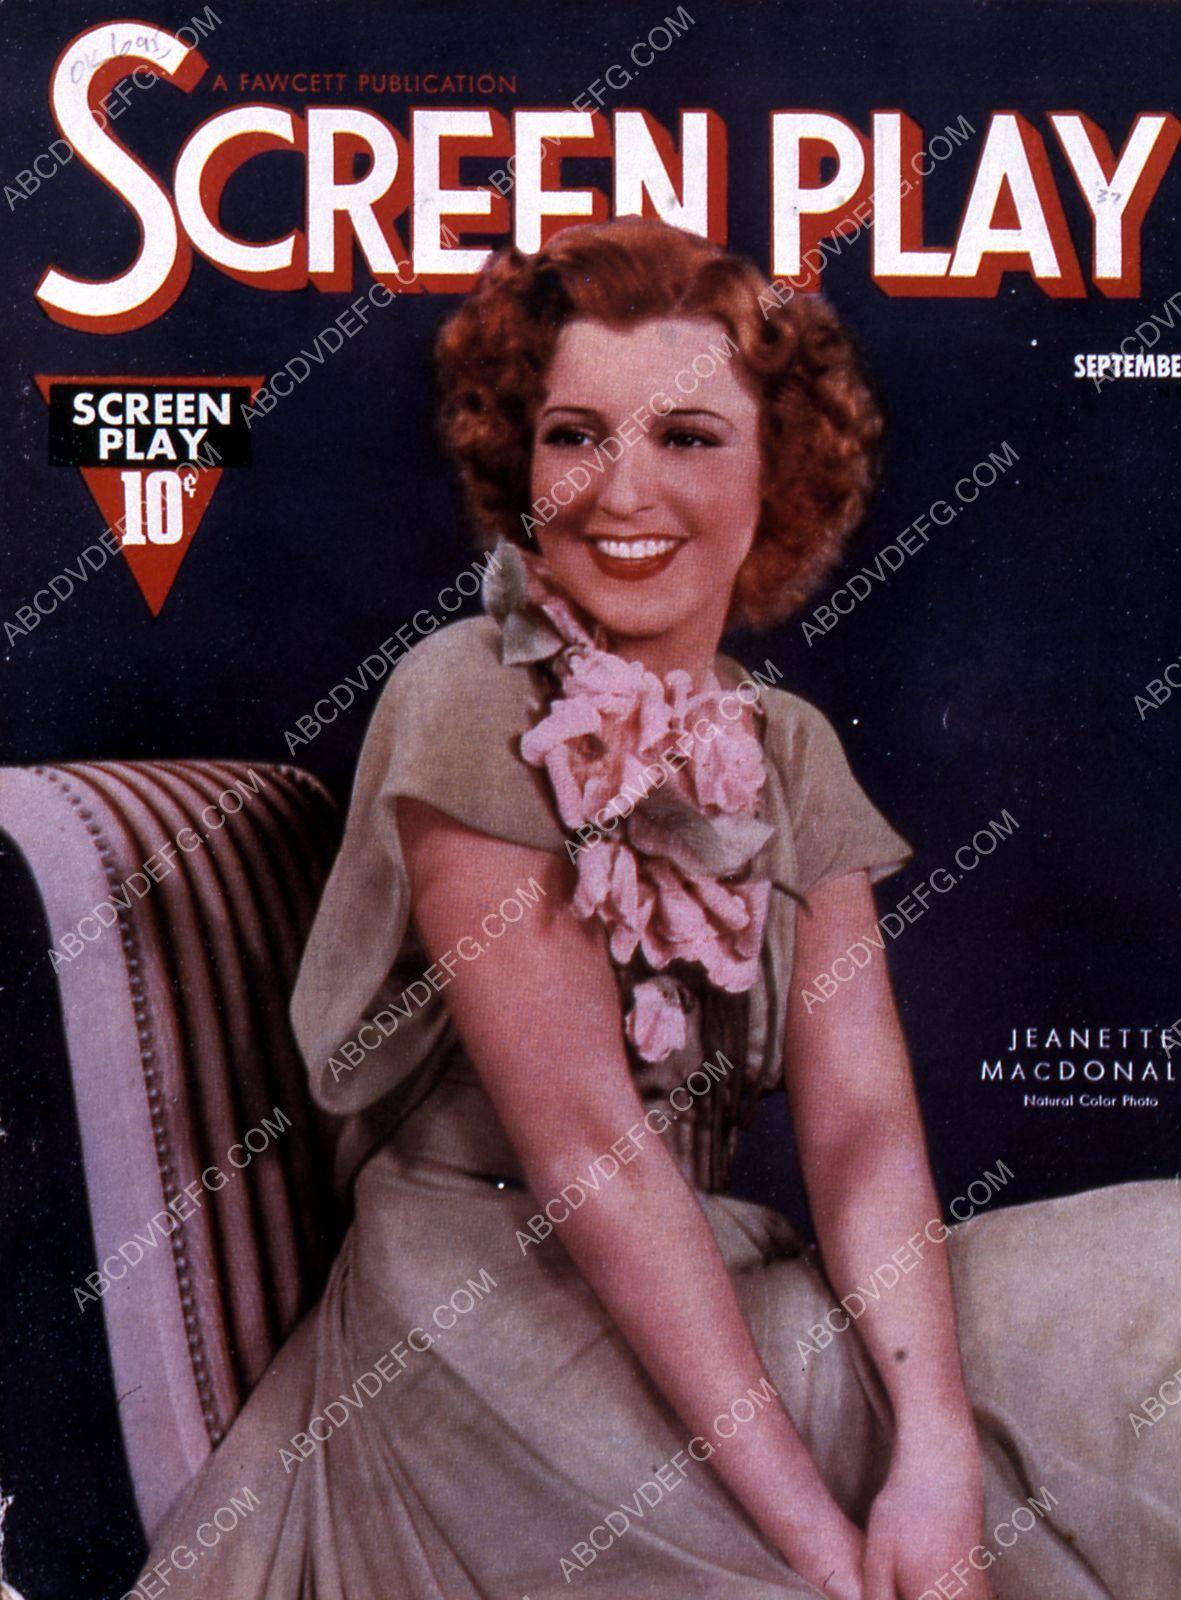 Jeanette MacDonald Screen Play magazine cover 35m-7752